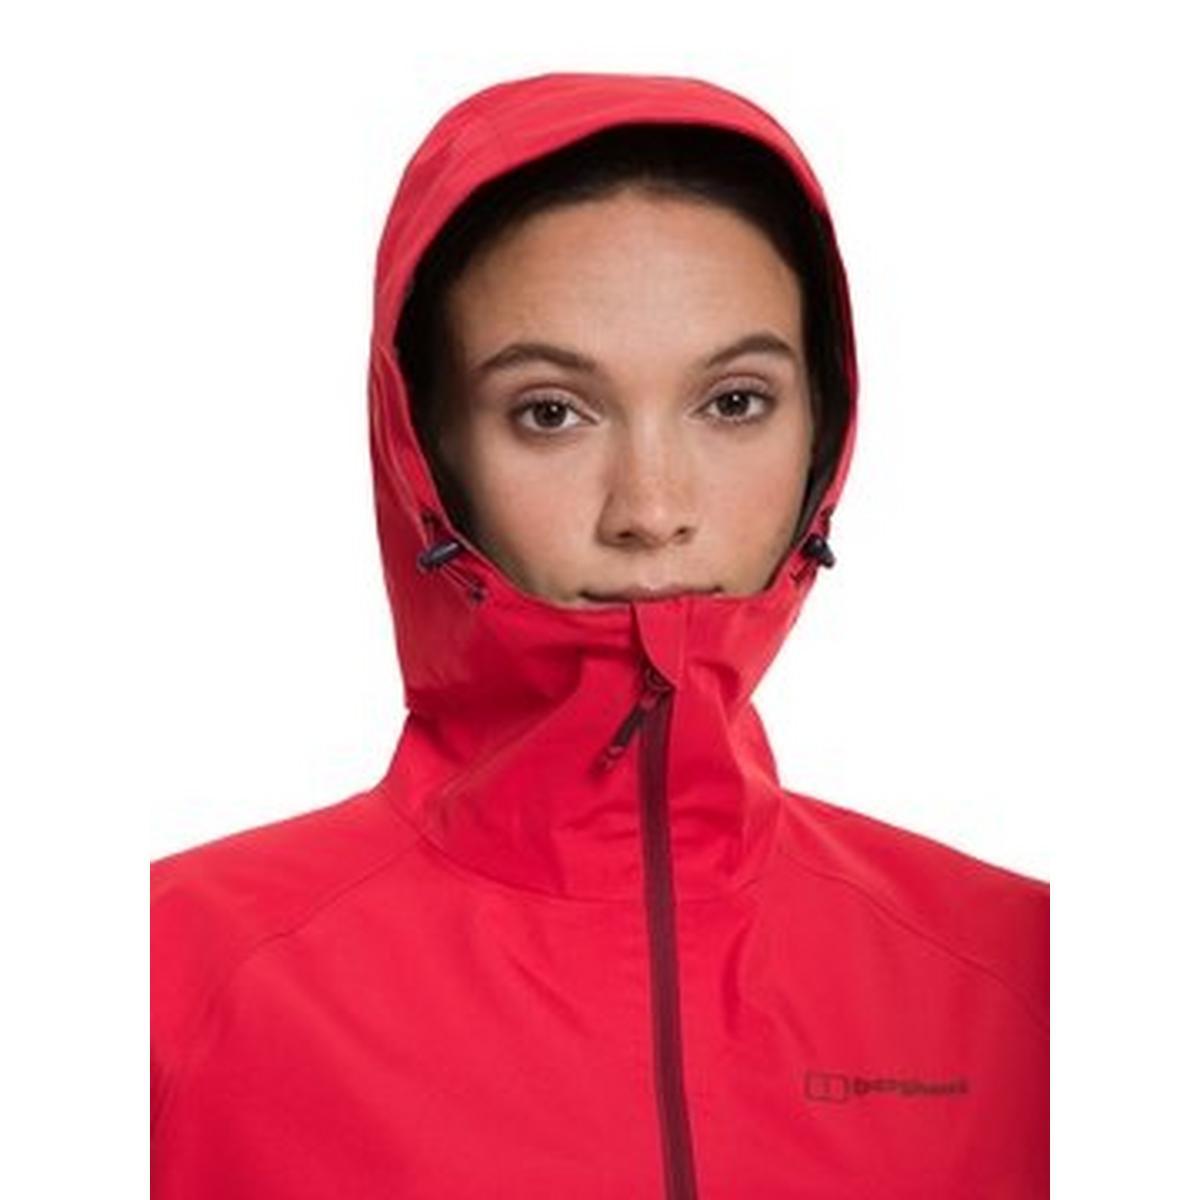 Berghaus Women's Paclite 2.0 GORE-TEX Waterproof Jacket